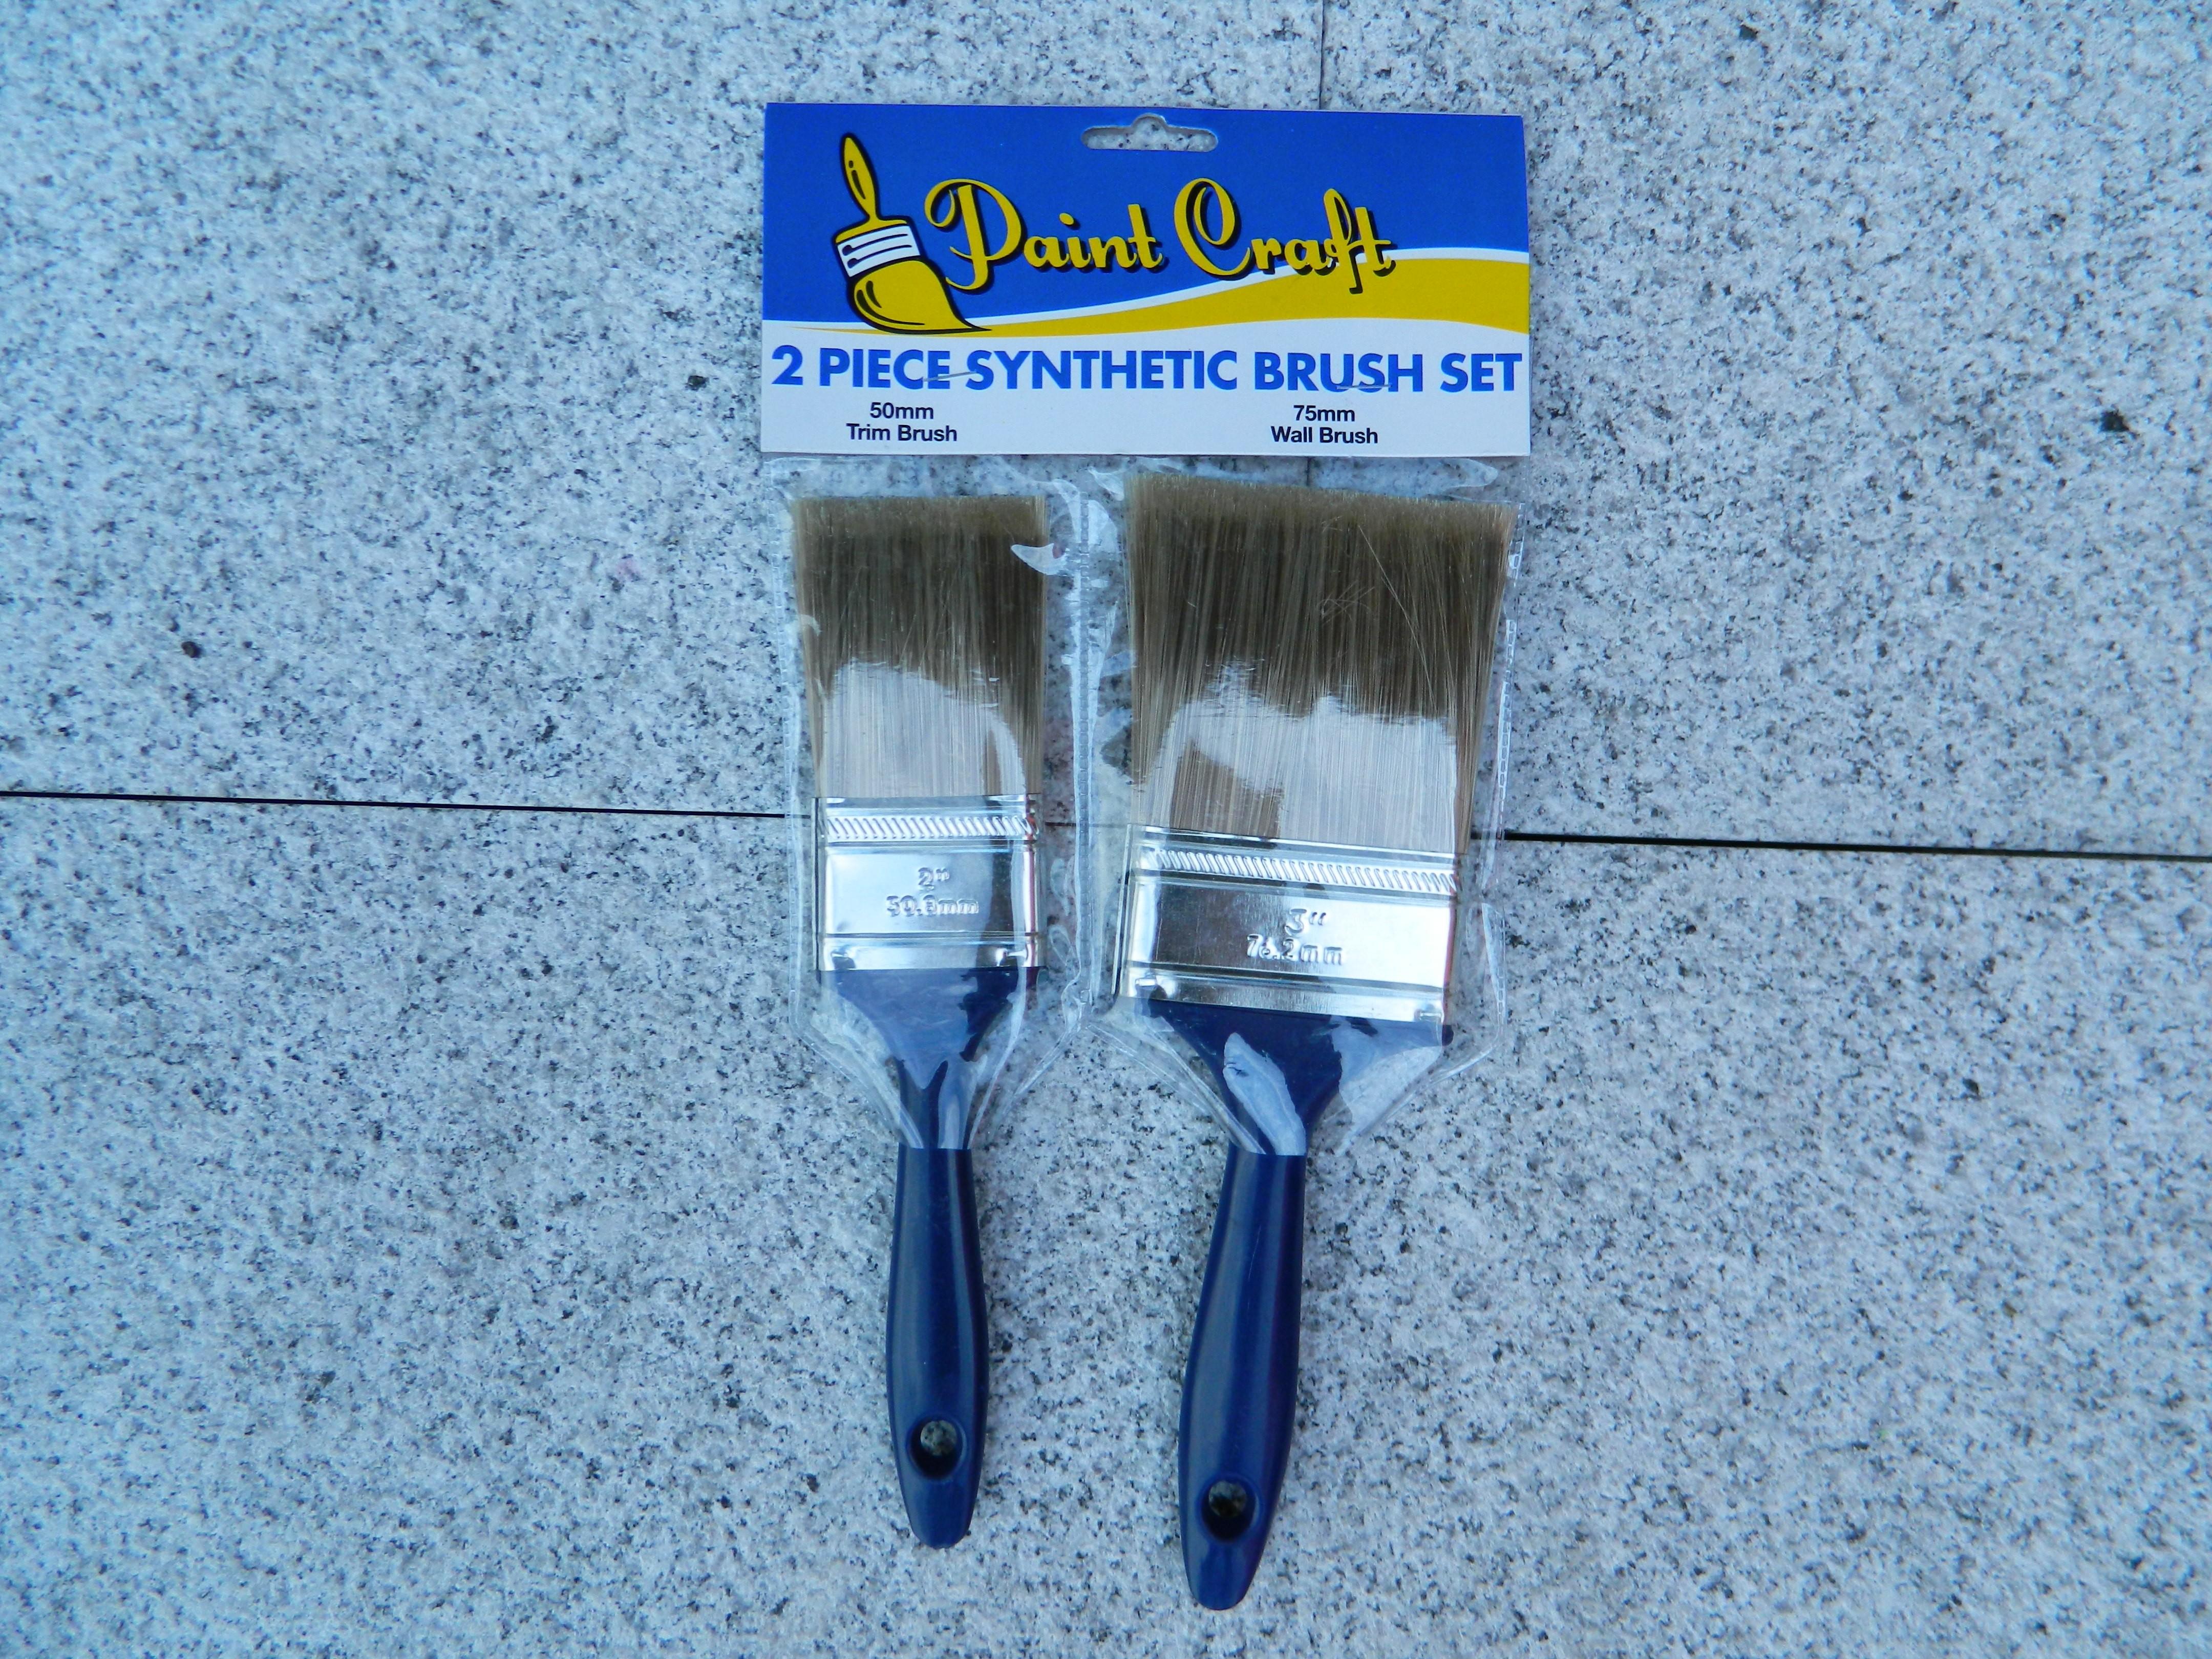 2 Piece Synthetic Brush Set